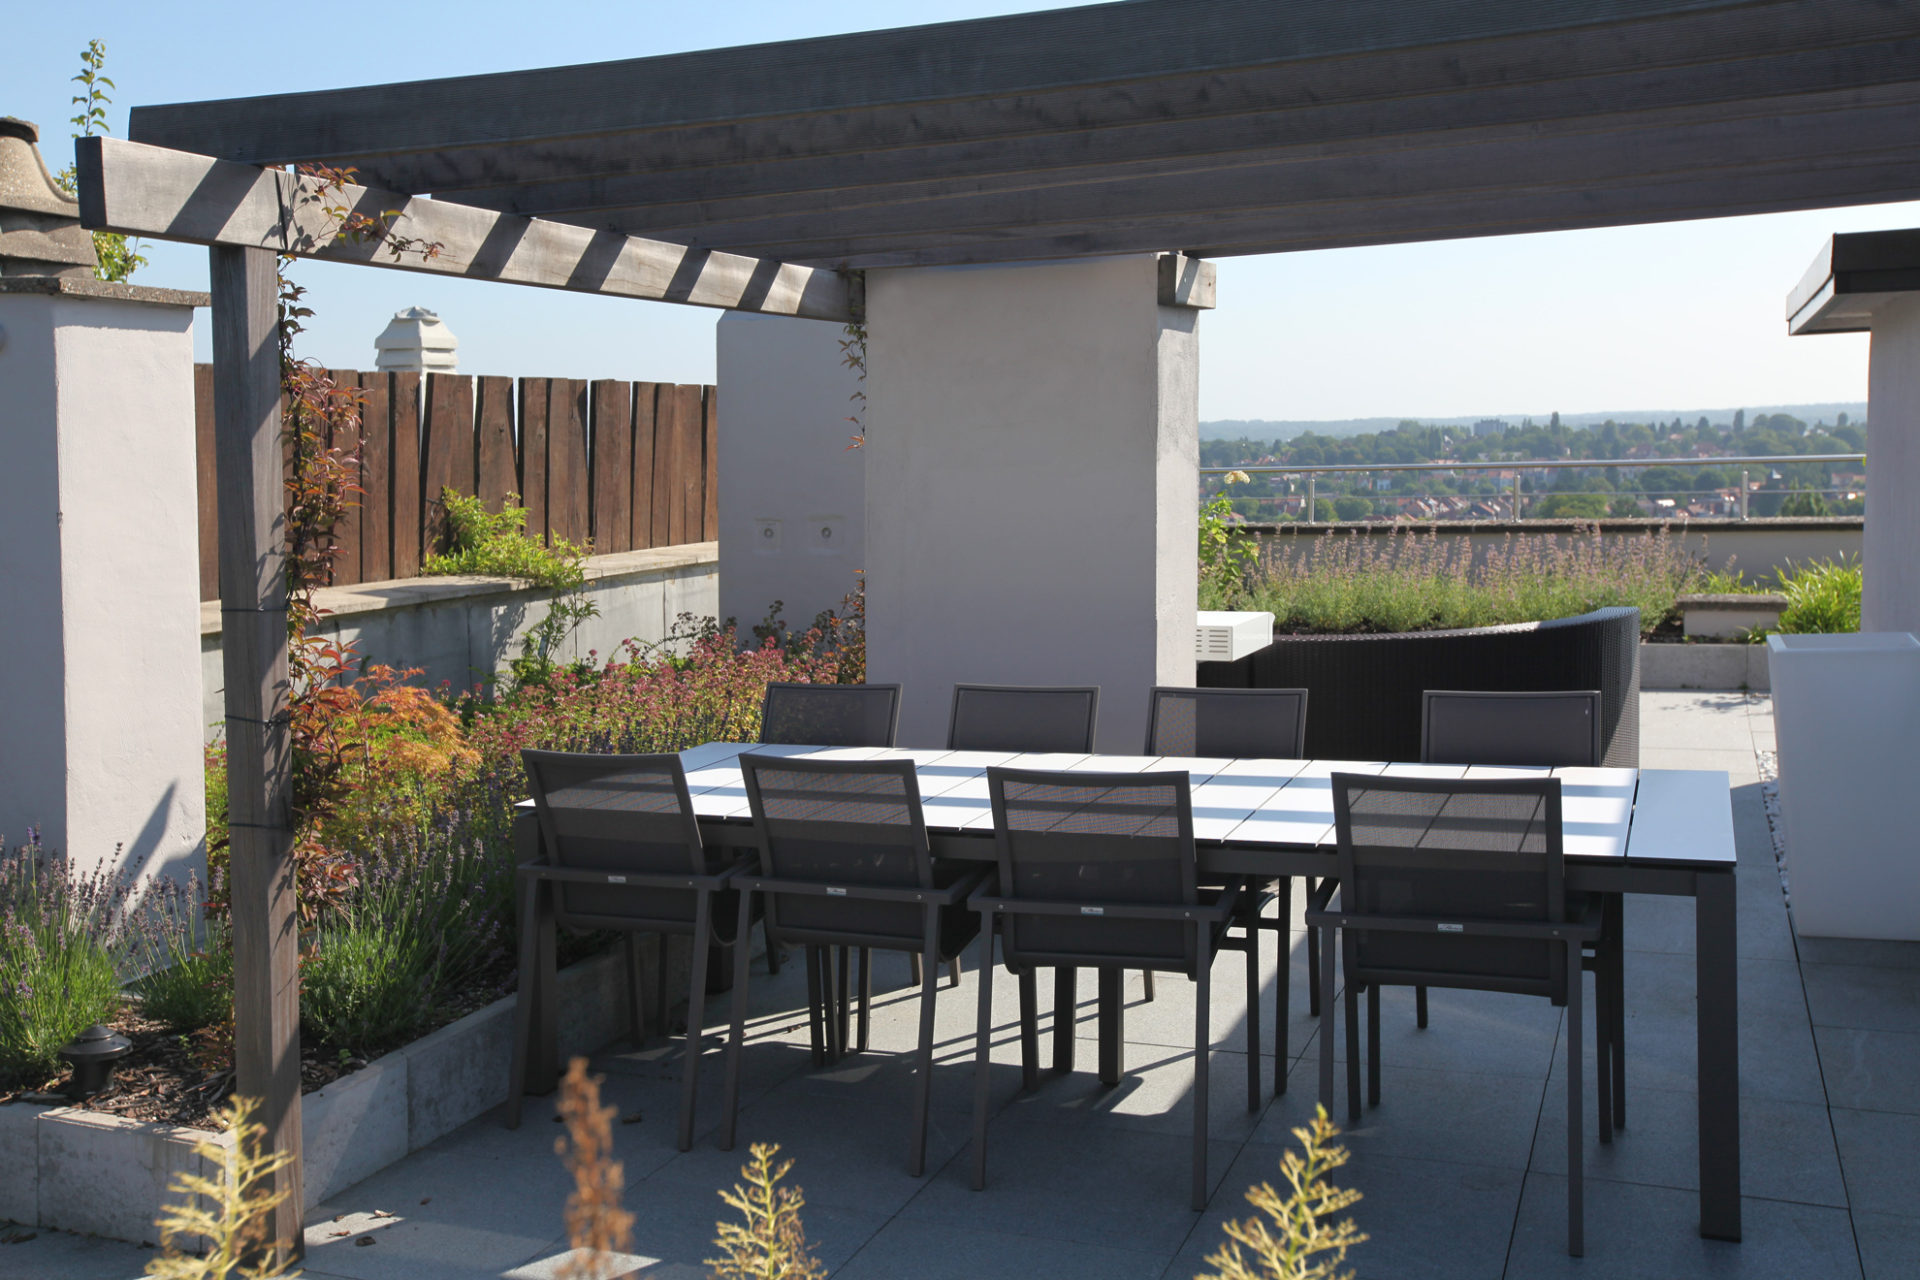 Penthouse in enger Landhausstil - Marcotte Style